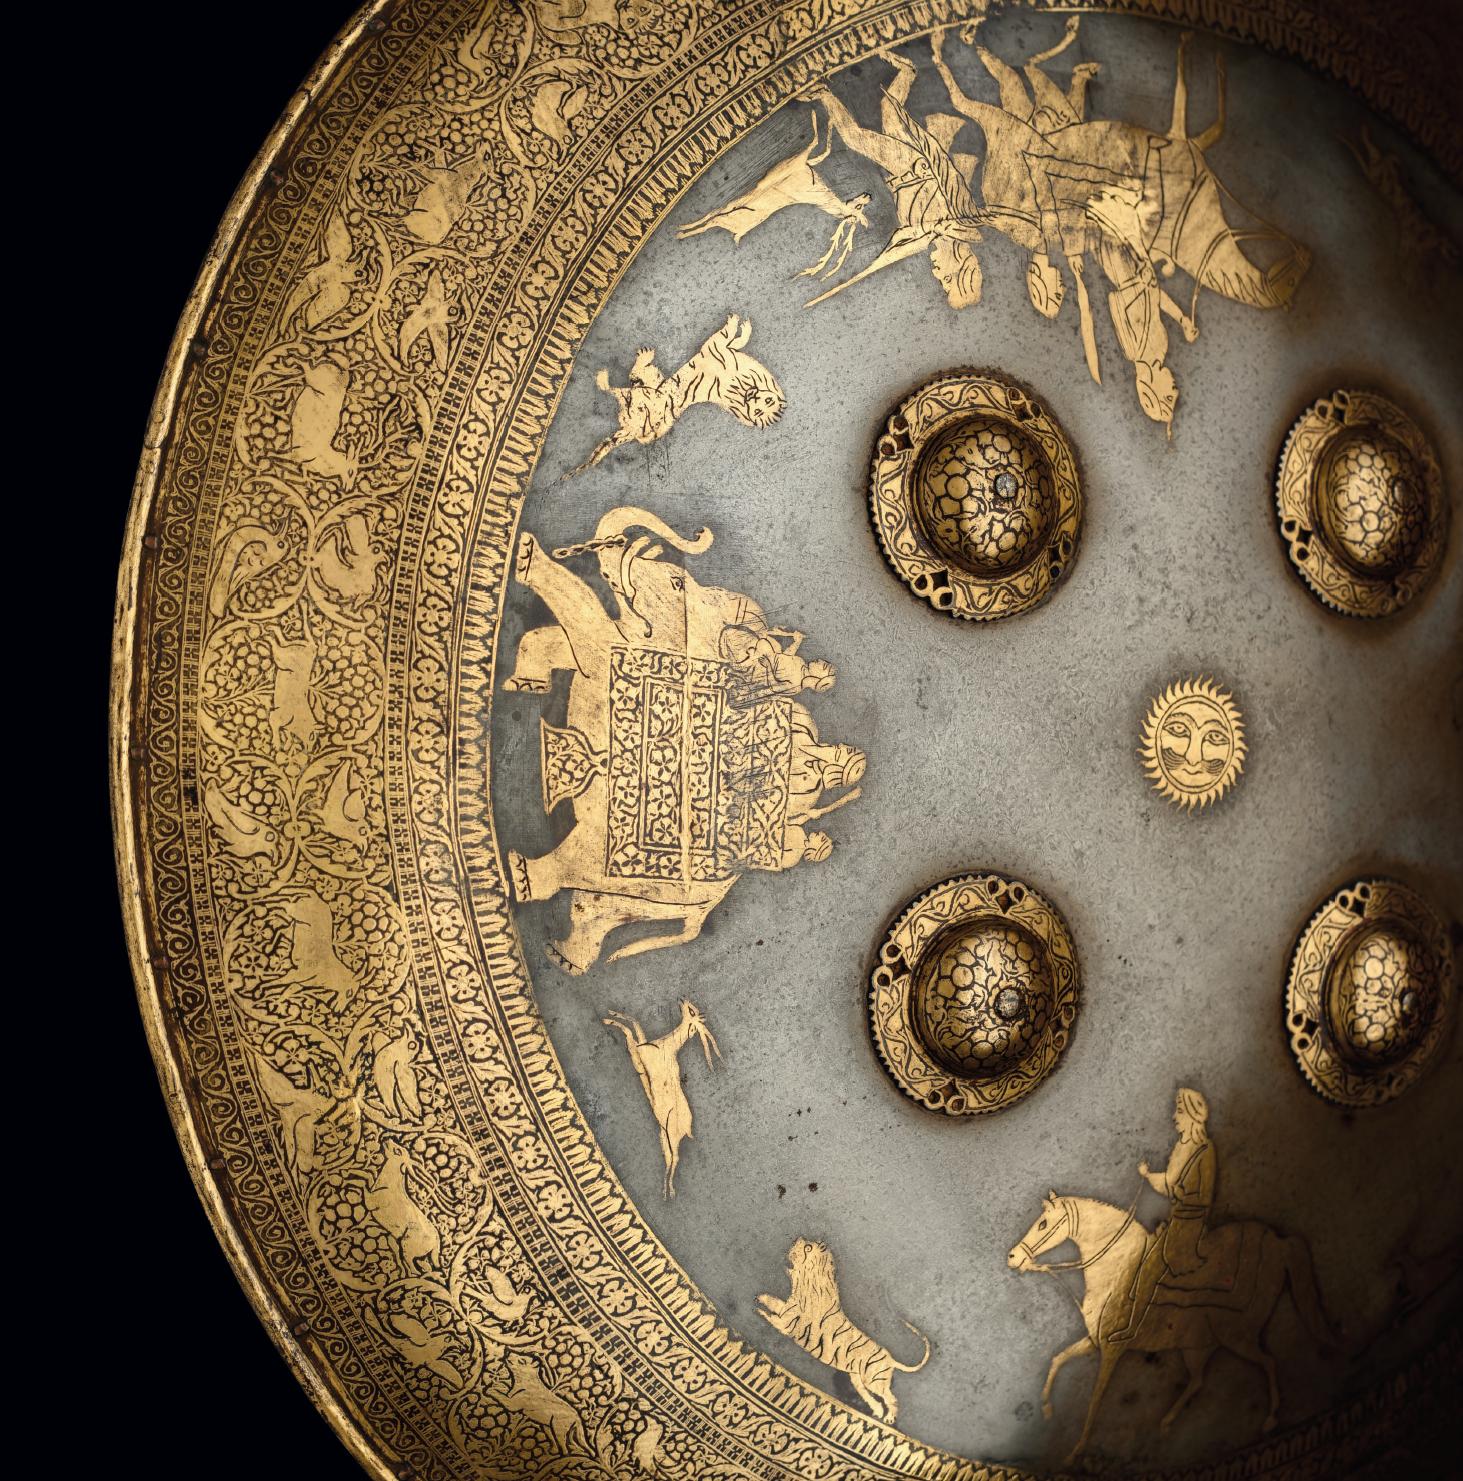 Figurative Sikh shield